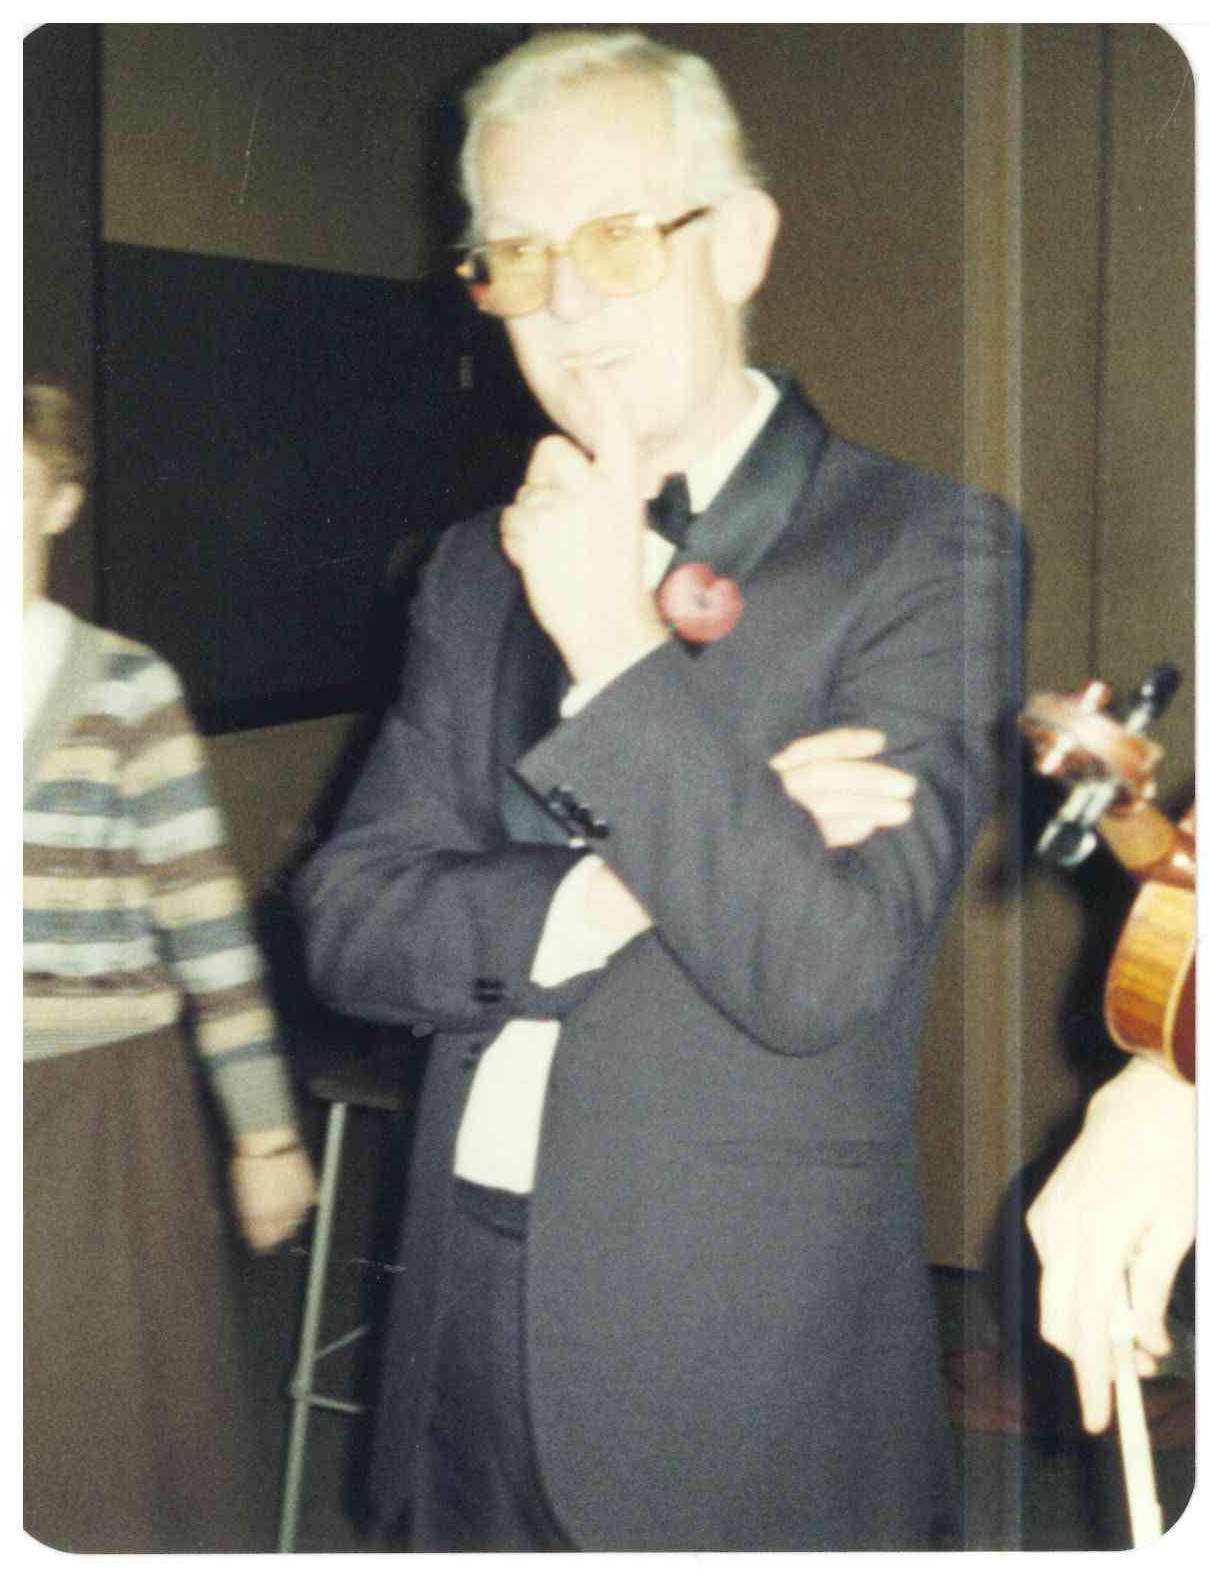 00129-9th November 1985 (1).jpg